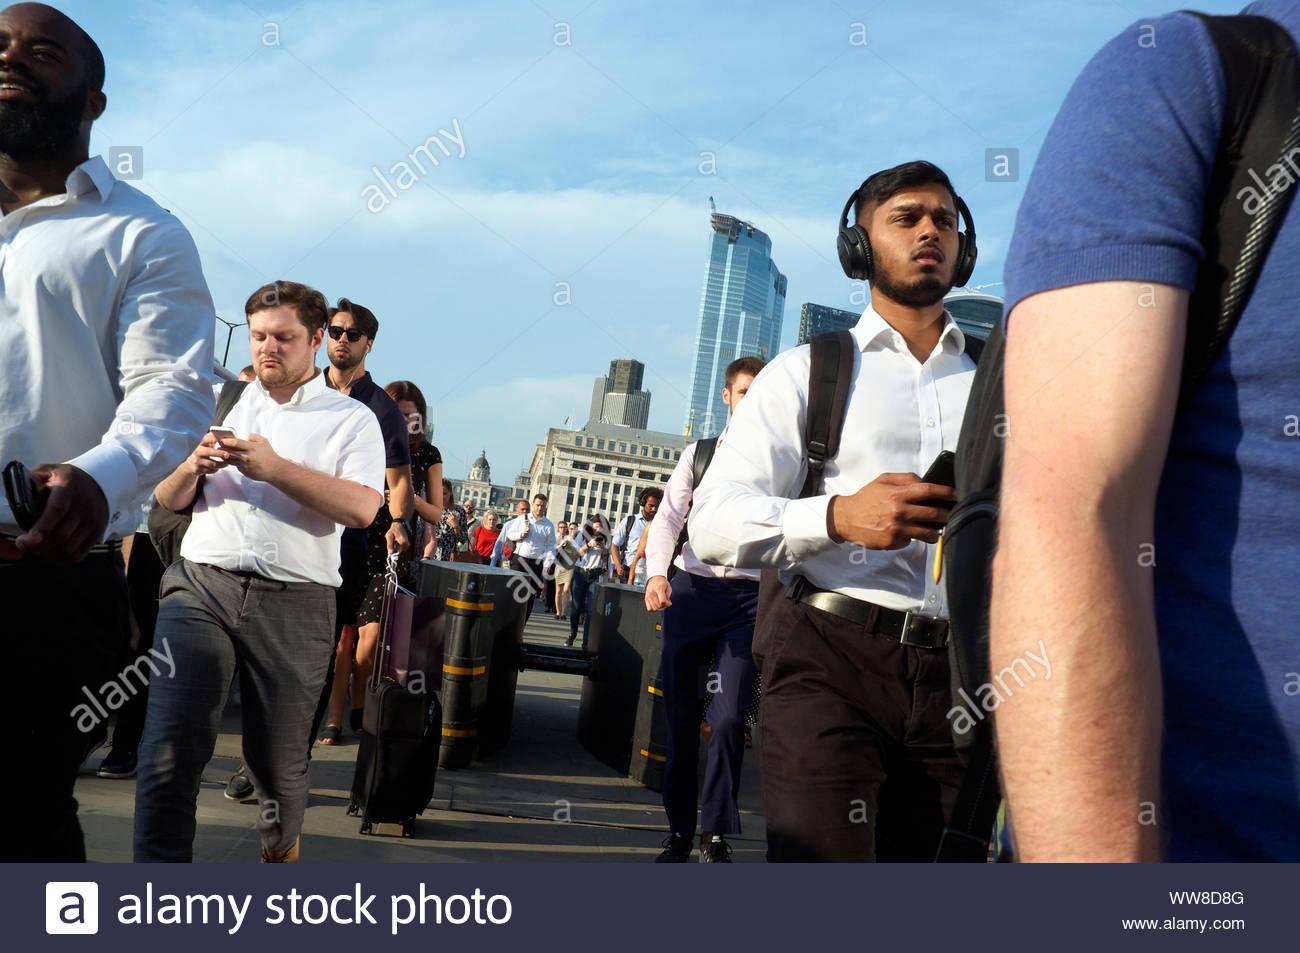 pedestrian-commuters-cross-london-bridge-at-the-end-of-the-day-london-uk-WW8D8G.jpg